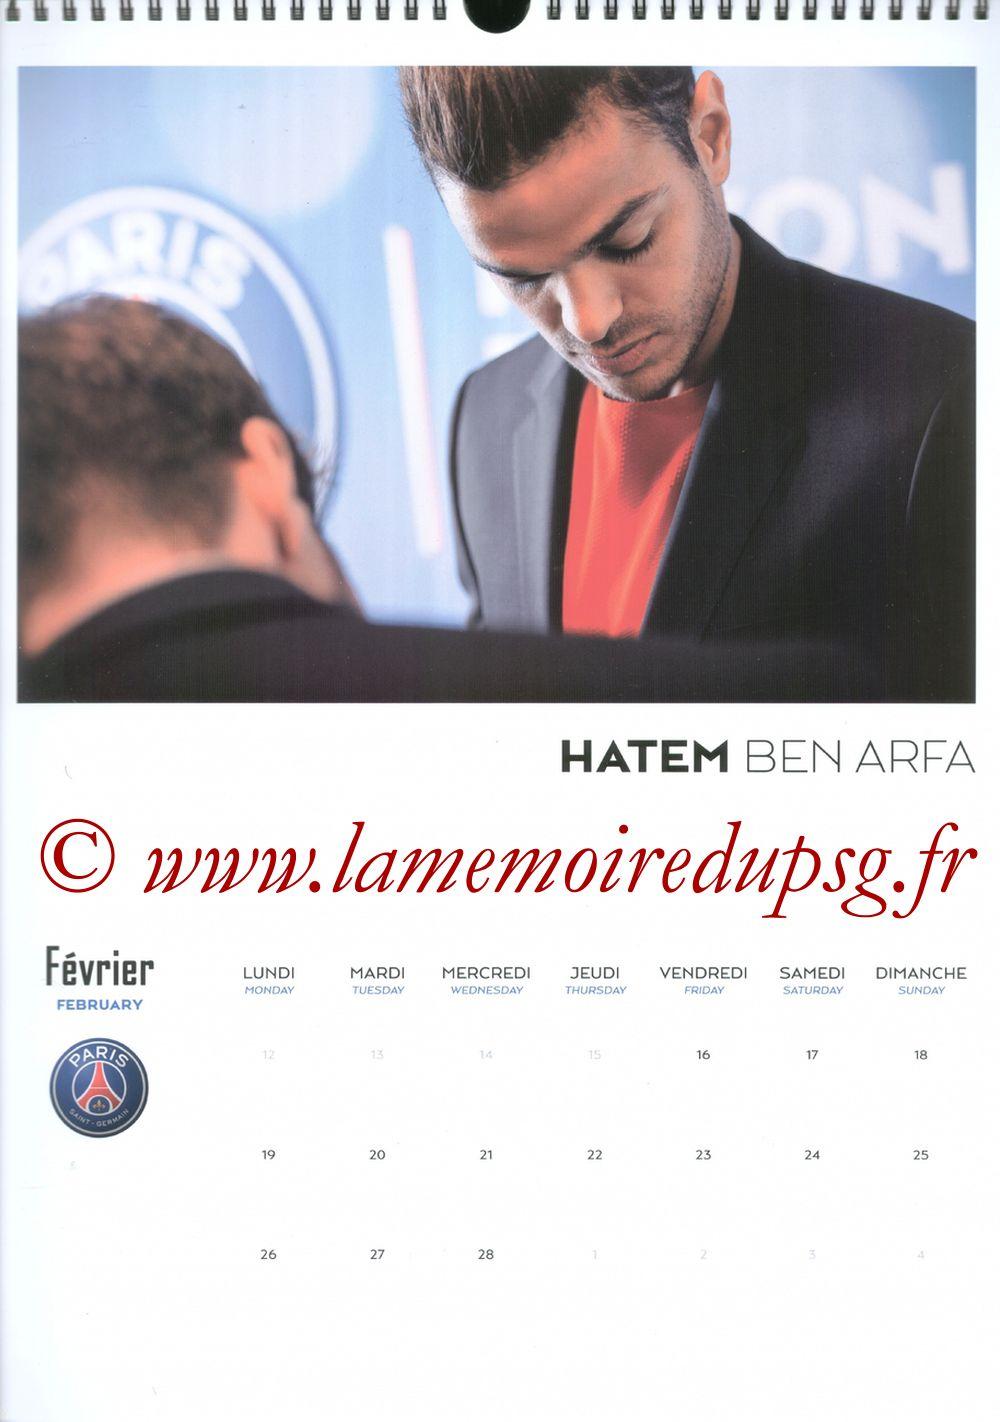 Calendrier PSG 2018 - Page 04 - Hatem BEN ARFA